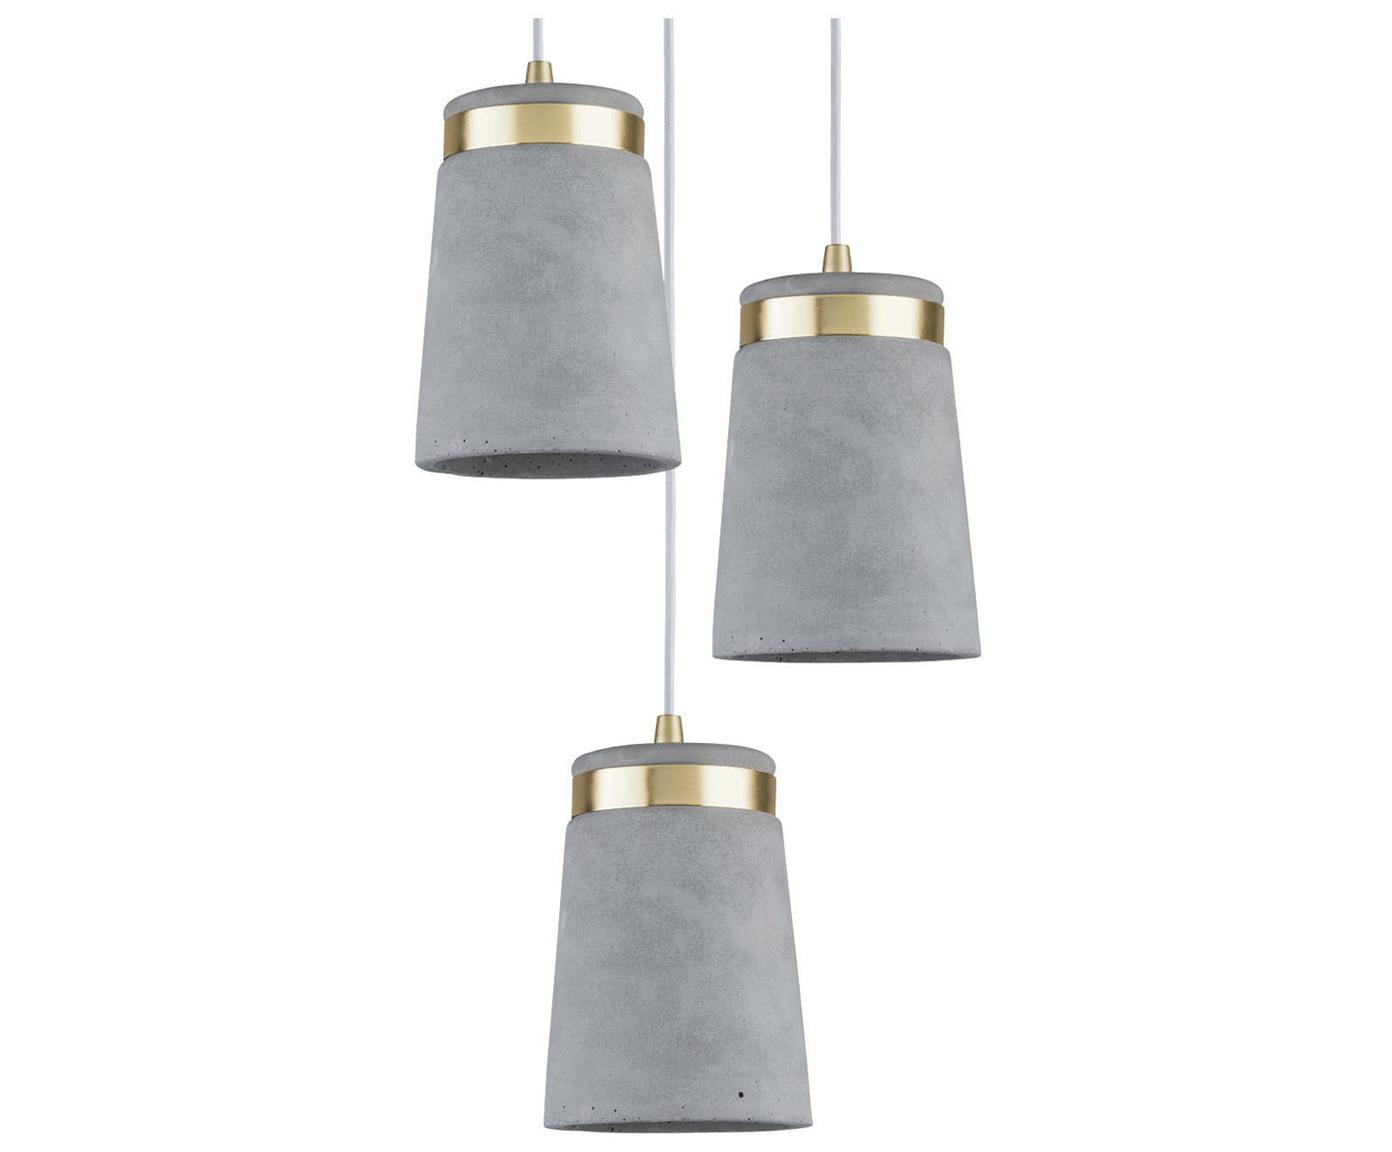 Beton-Pendelleuchte Norell, Lampenschirm: Beton, Grau, Messingfarben, Ø 12 x H 17 cm